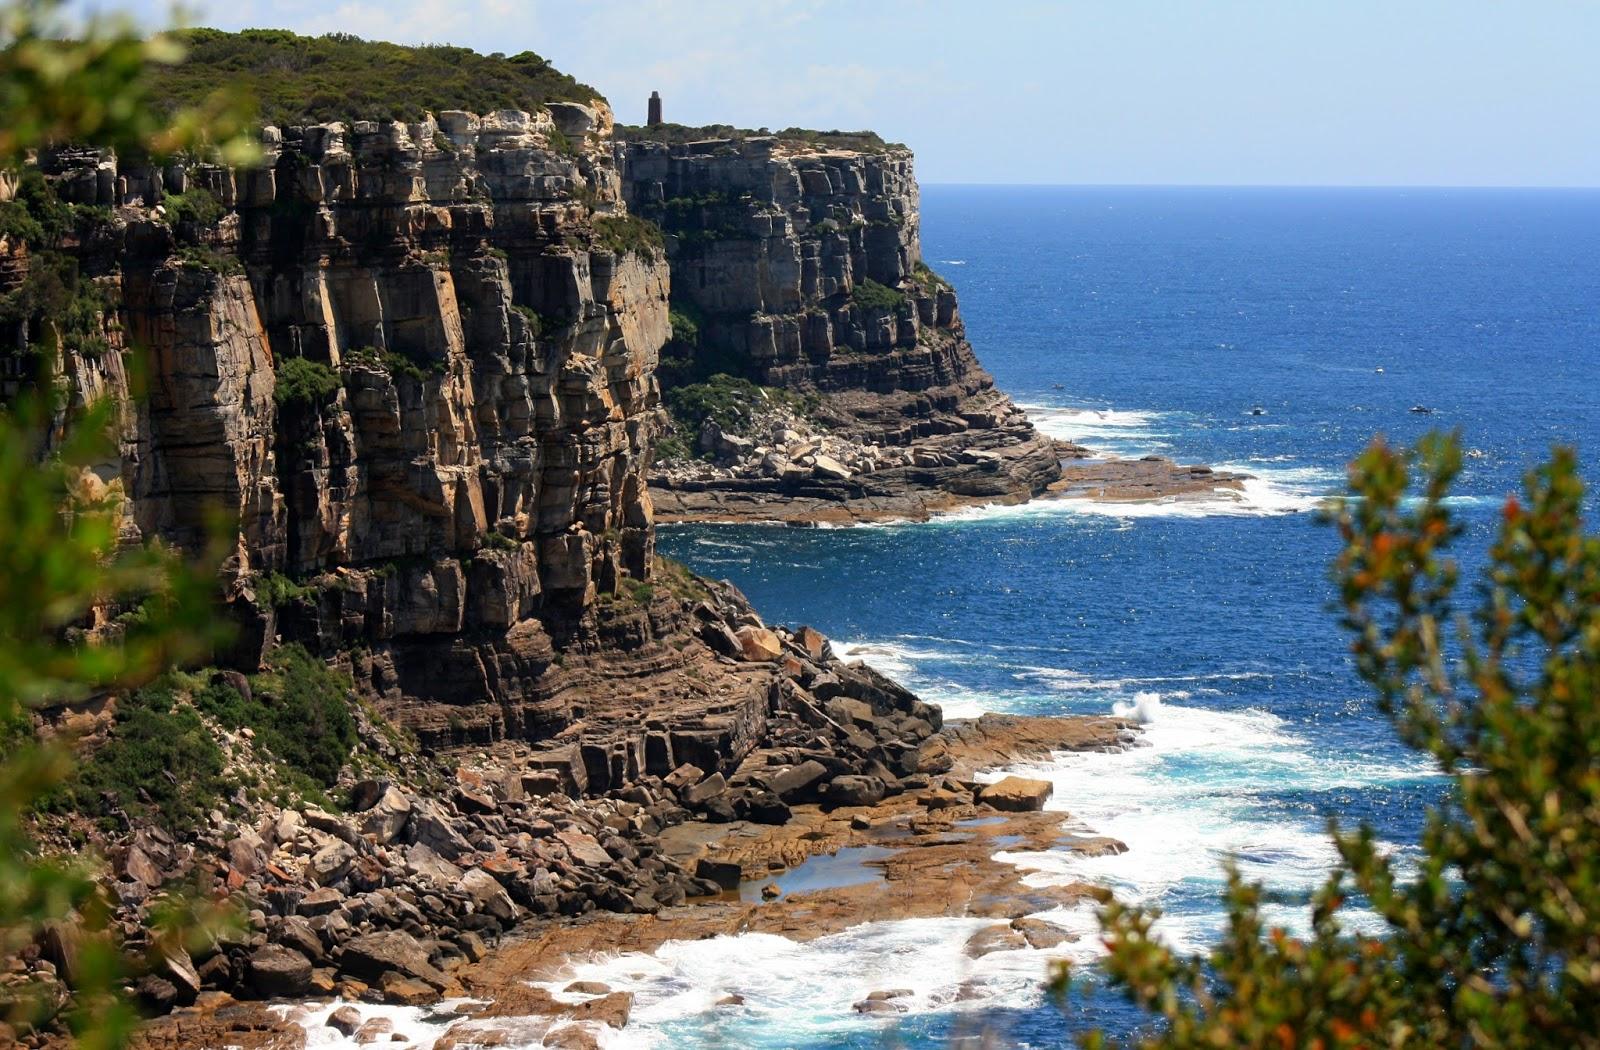 5 Of The Best Hikes in Australia (Hiking Australia ... |Hiking Australia